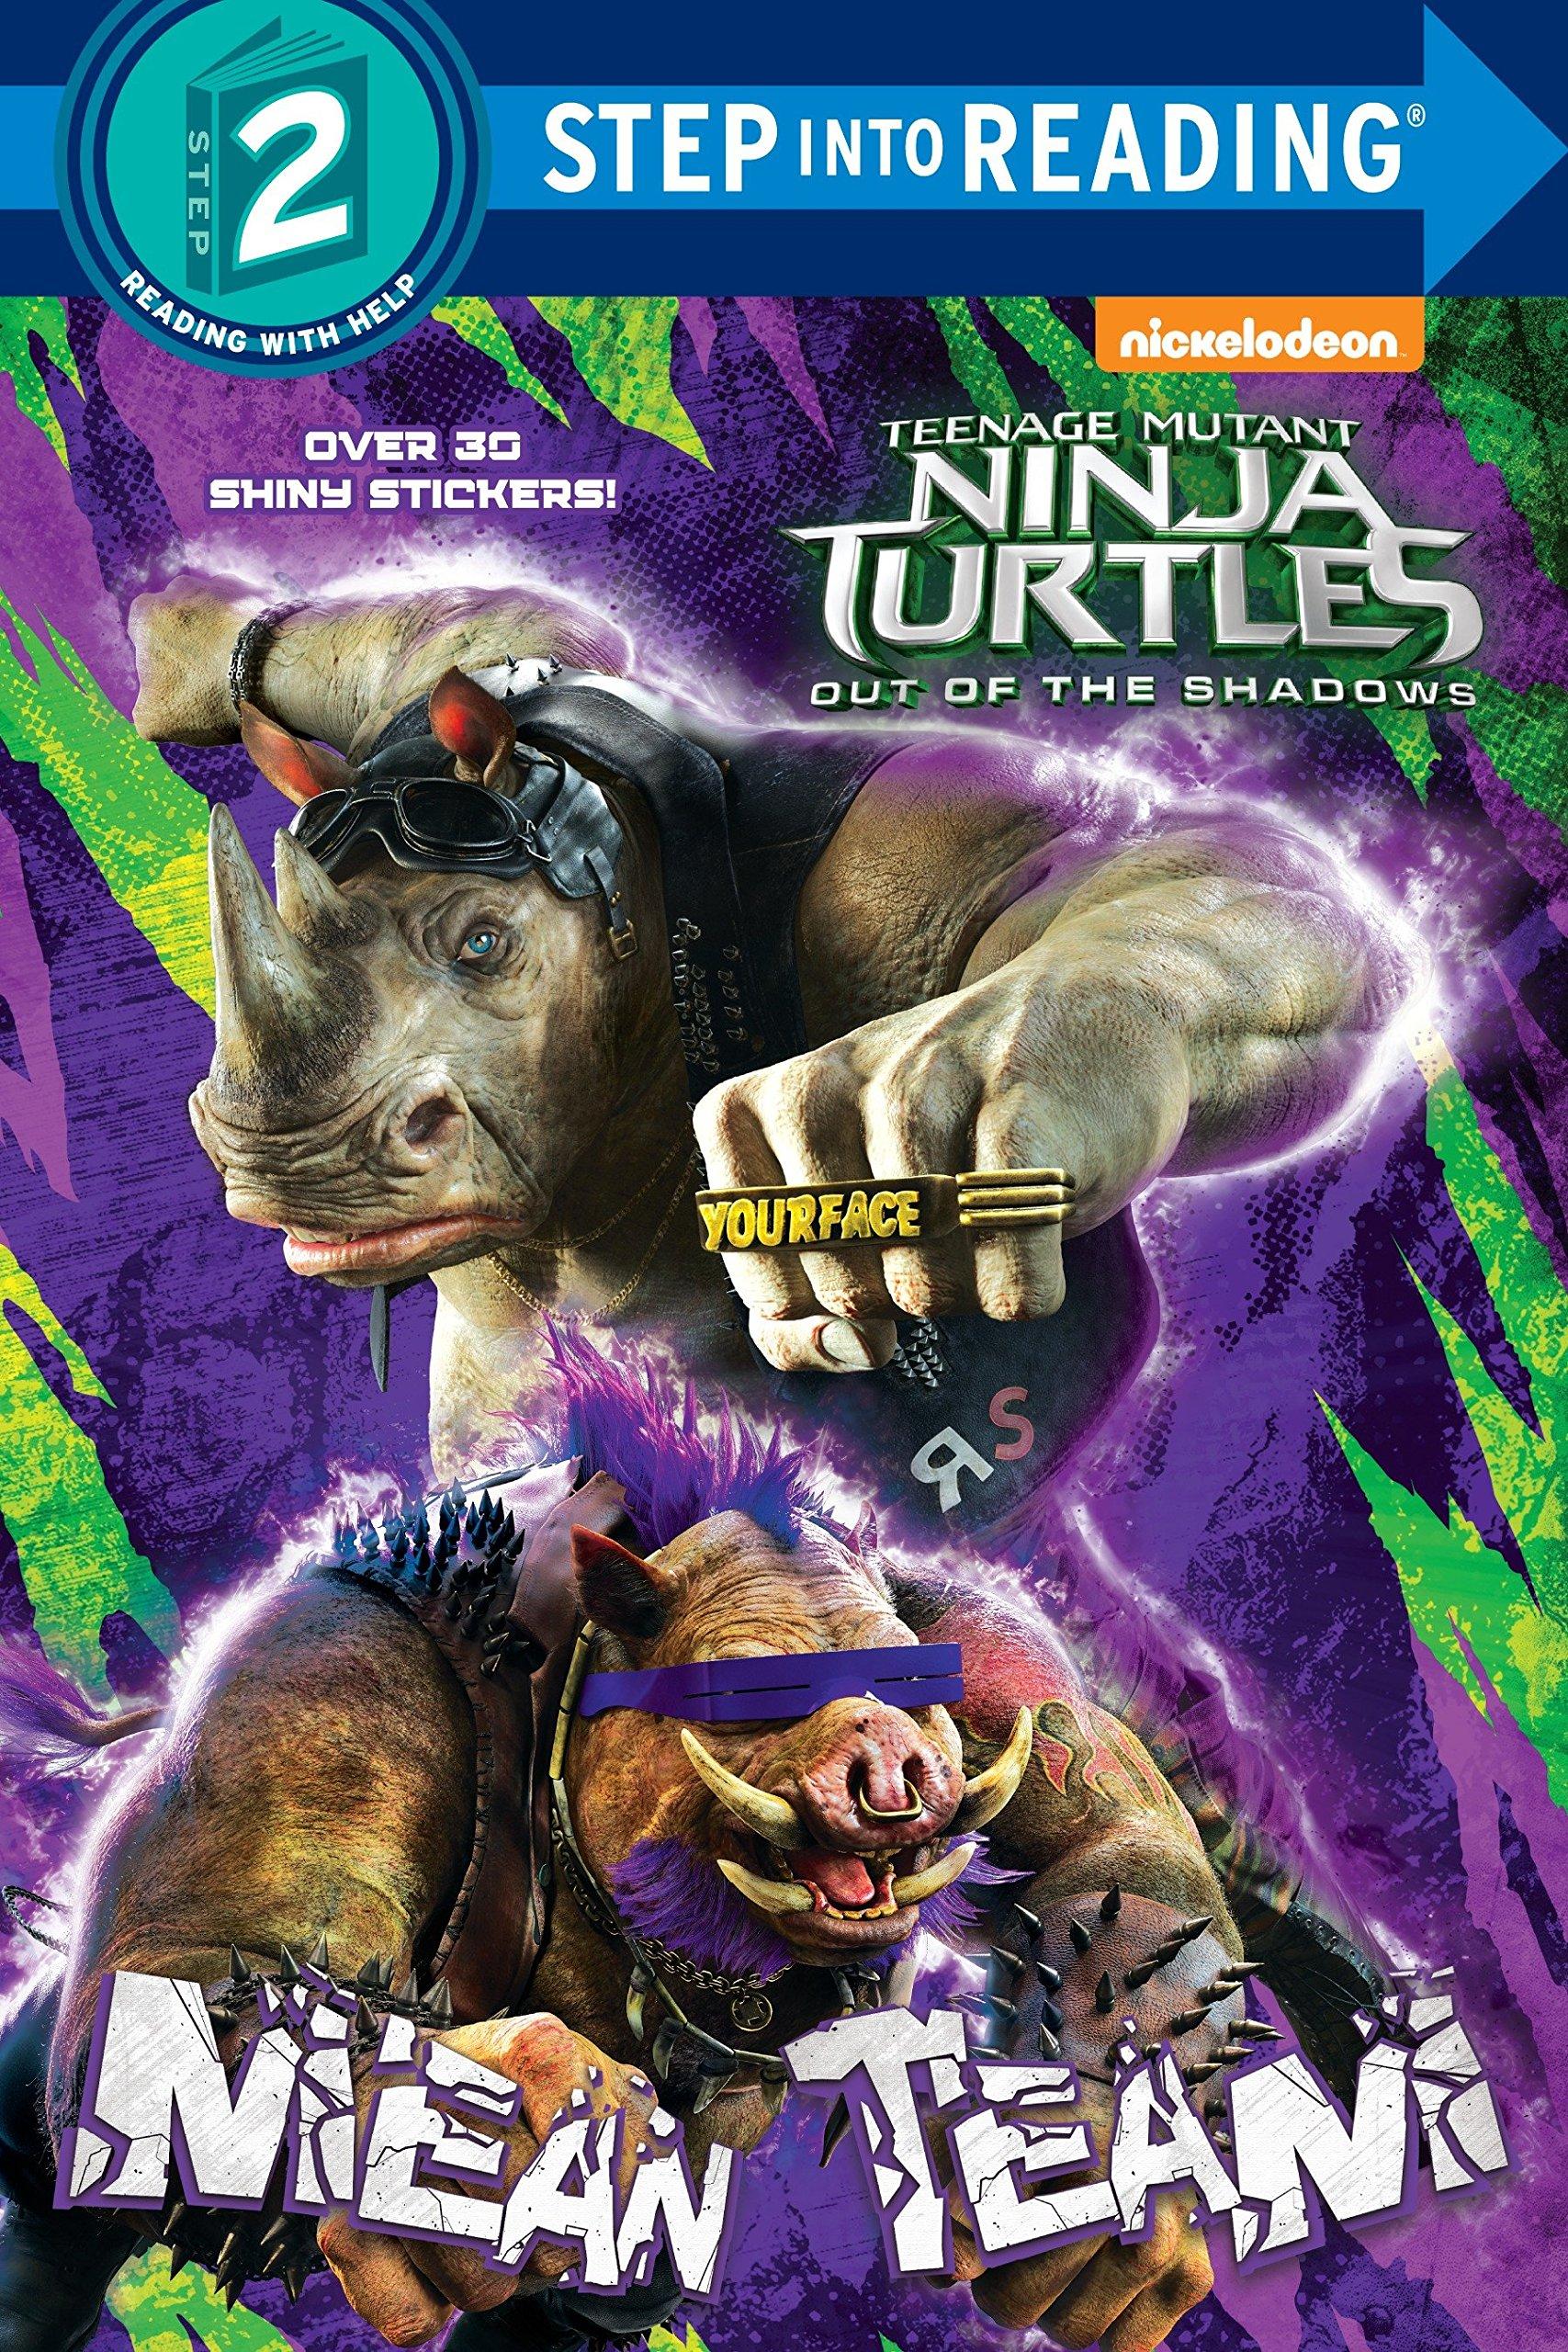 Mean Team Teenage Mutant Ninja Turtles: Out of the Shadows ...